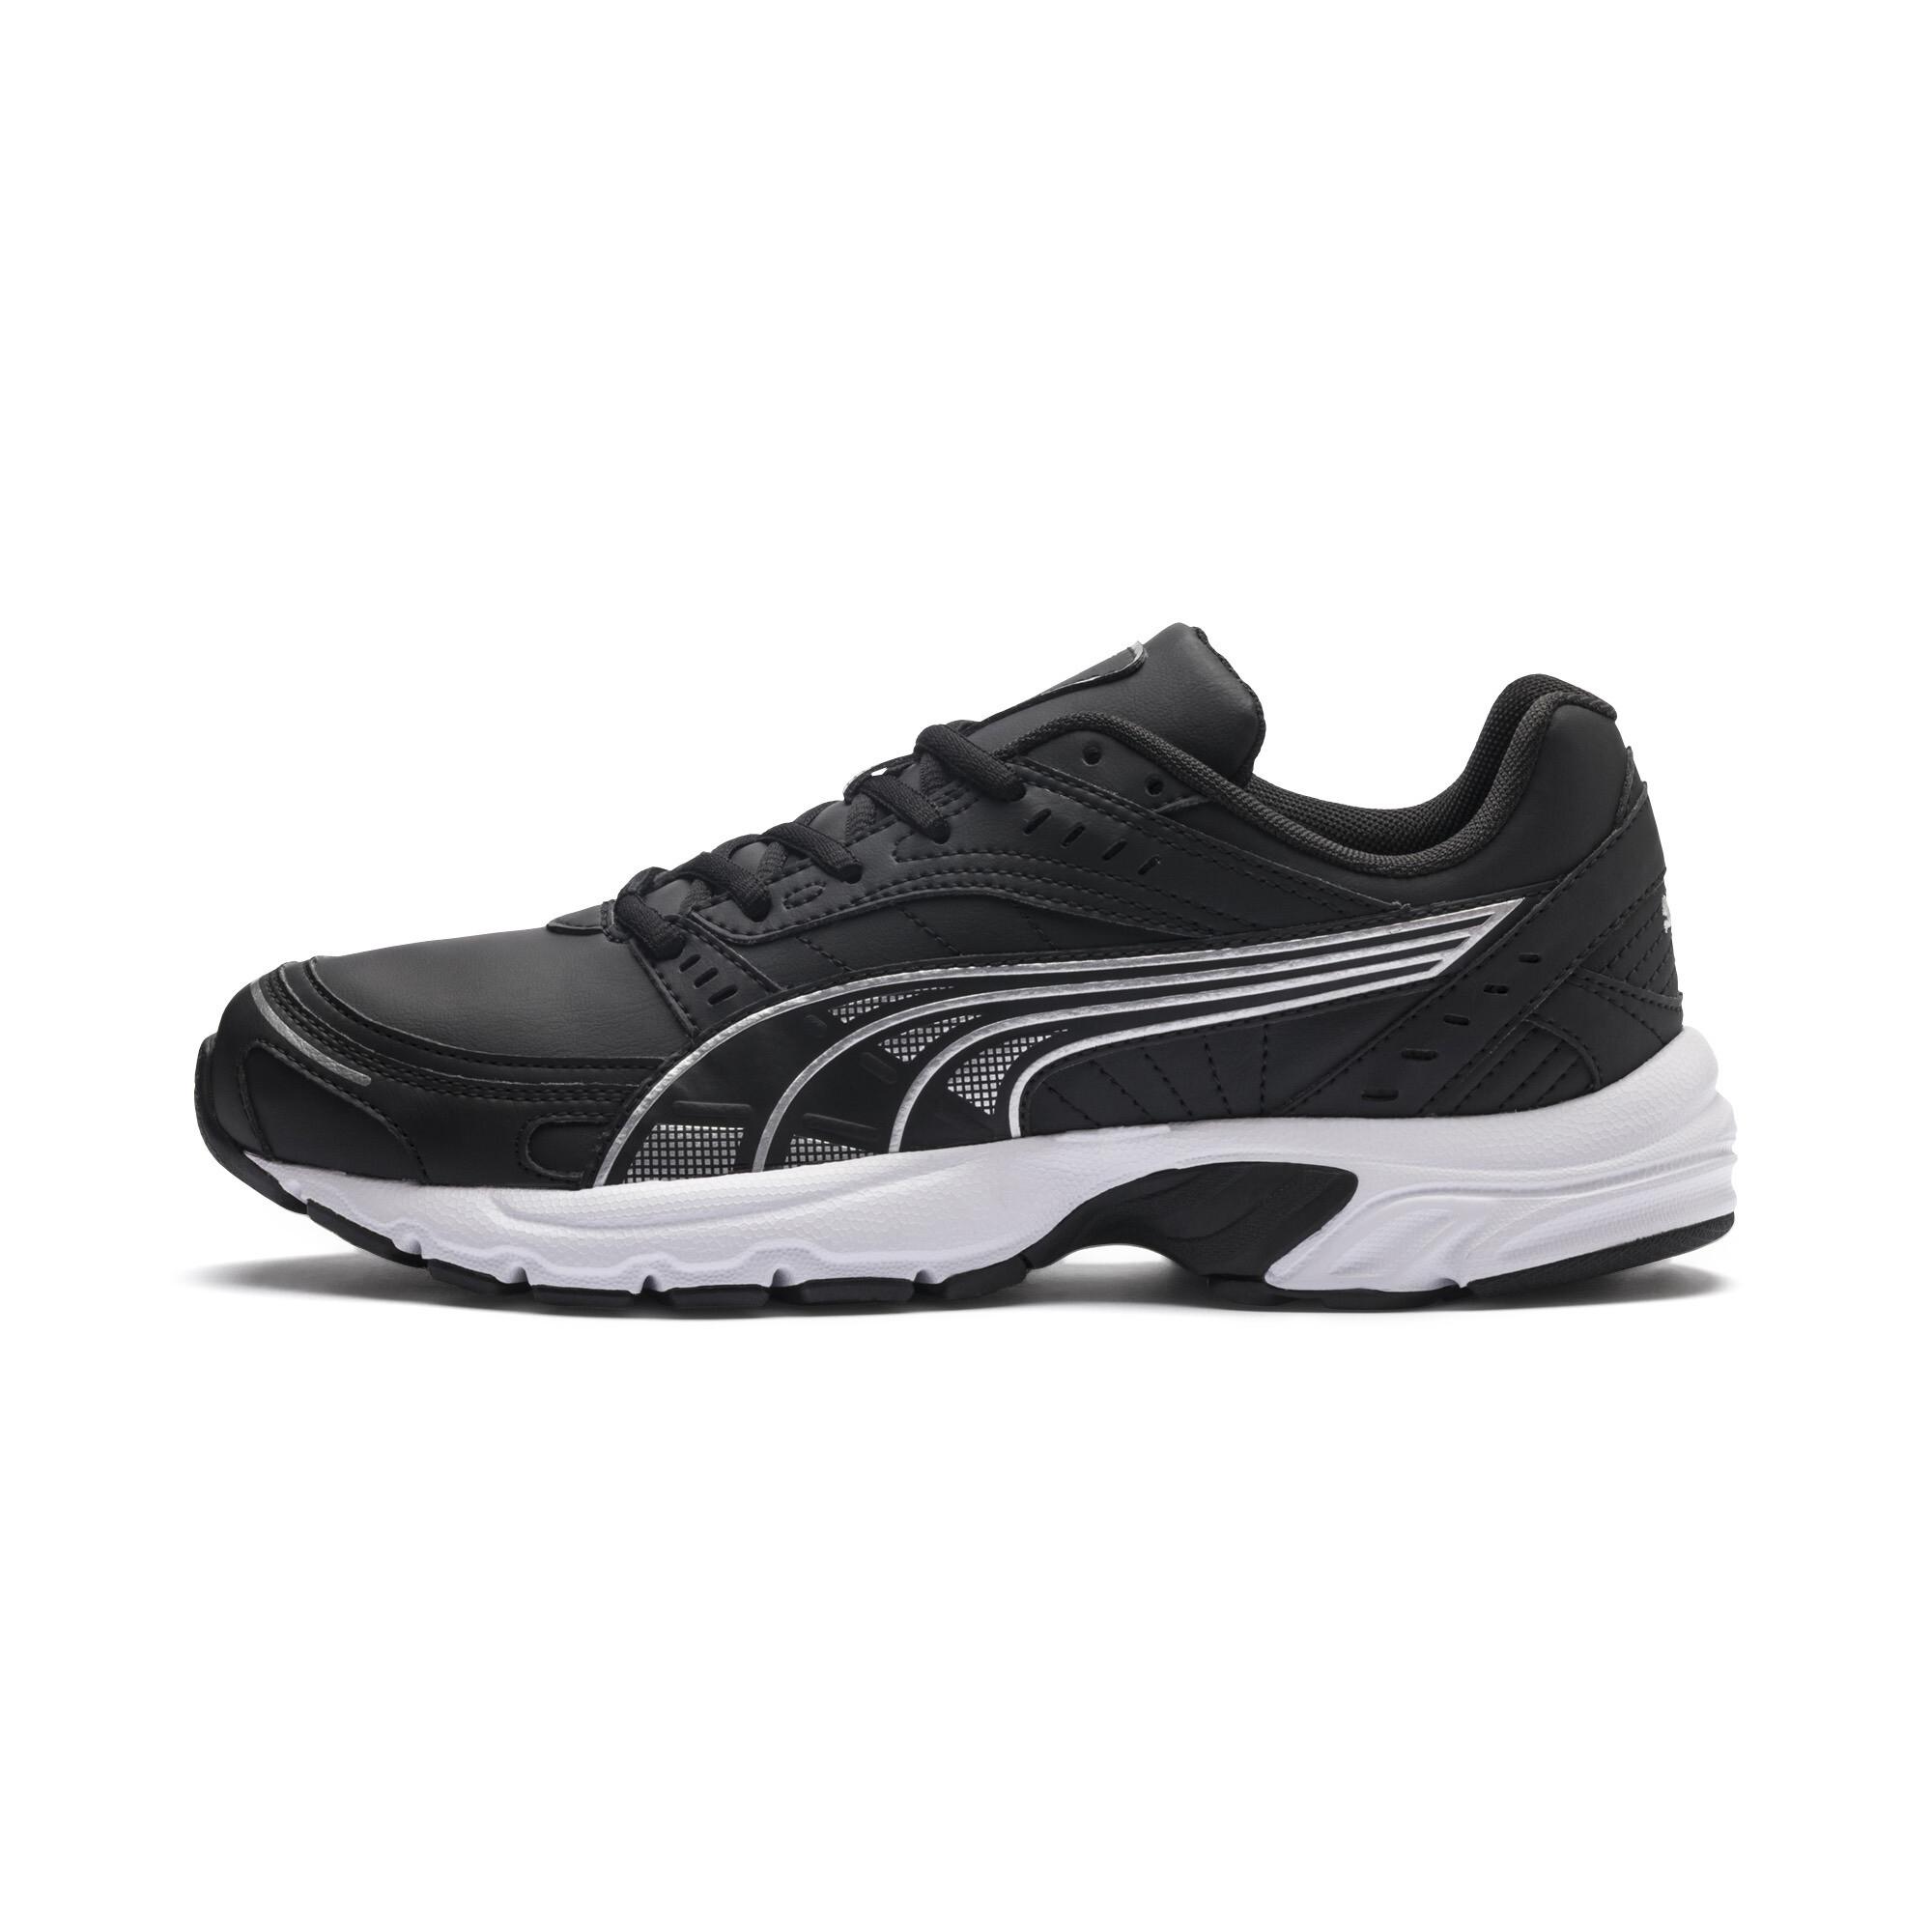 PUMA-Men-039-s-Axis-SL-Sneakers thumbnail 10